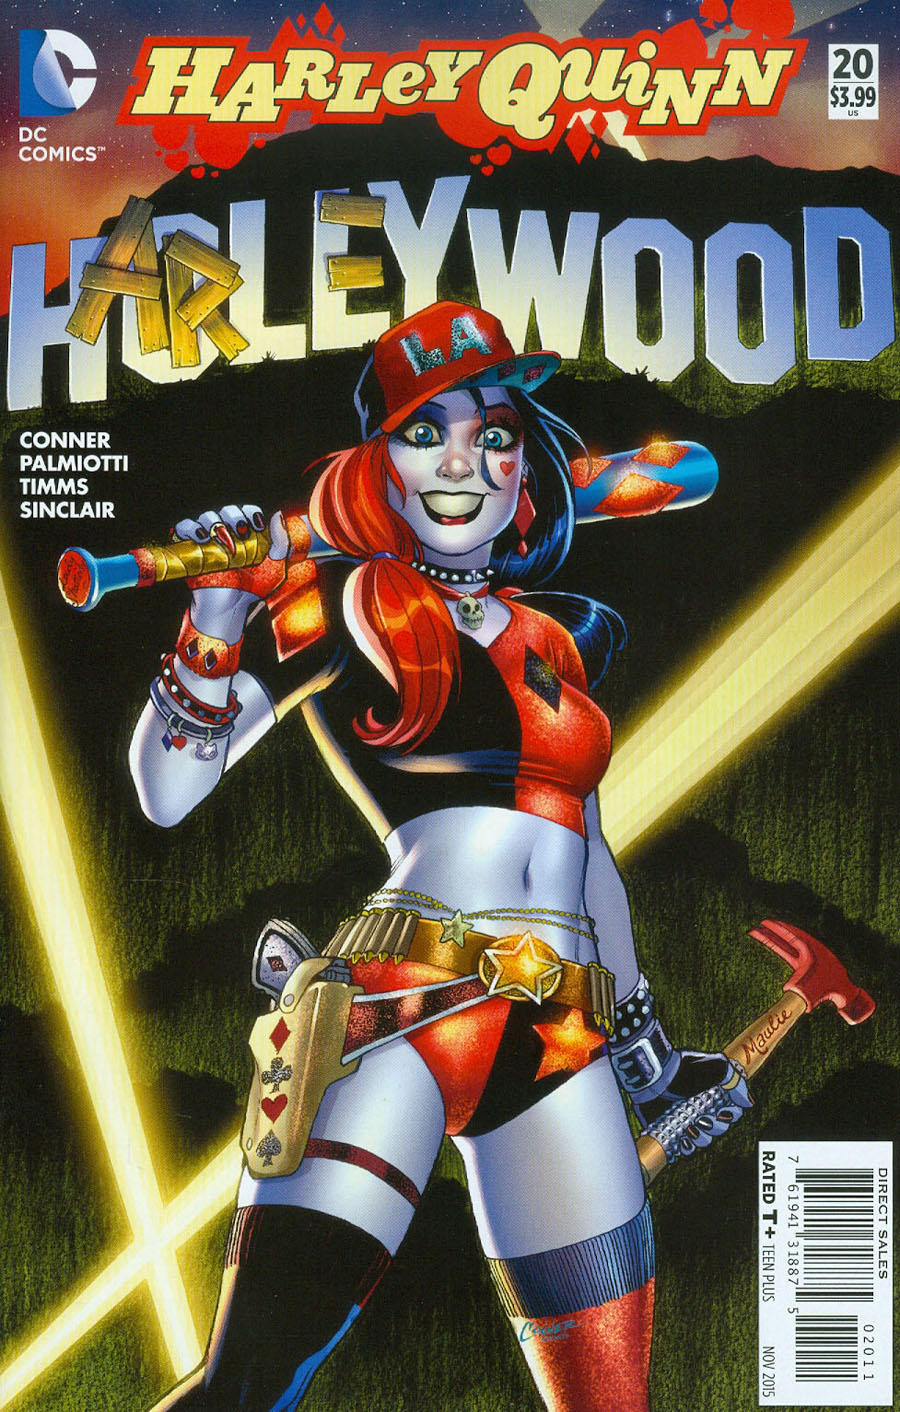 Harley Quinn Vol 2 #20 Cover A Regular Amanda Conner Cover